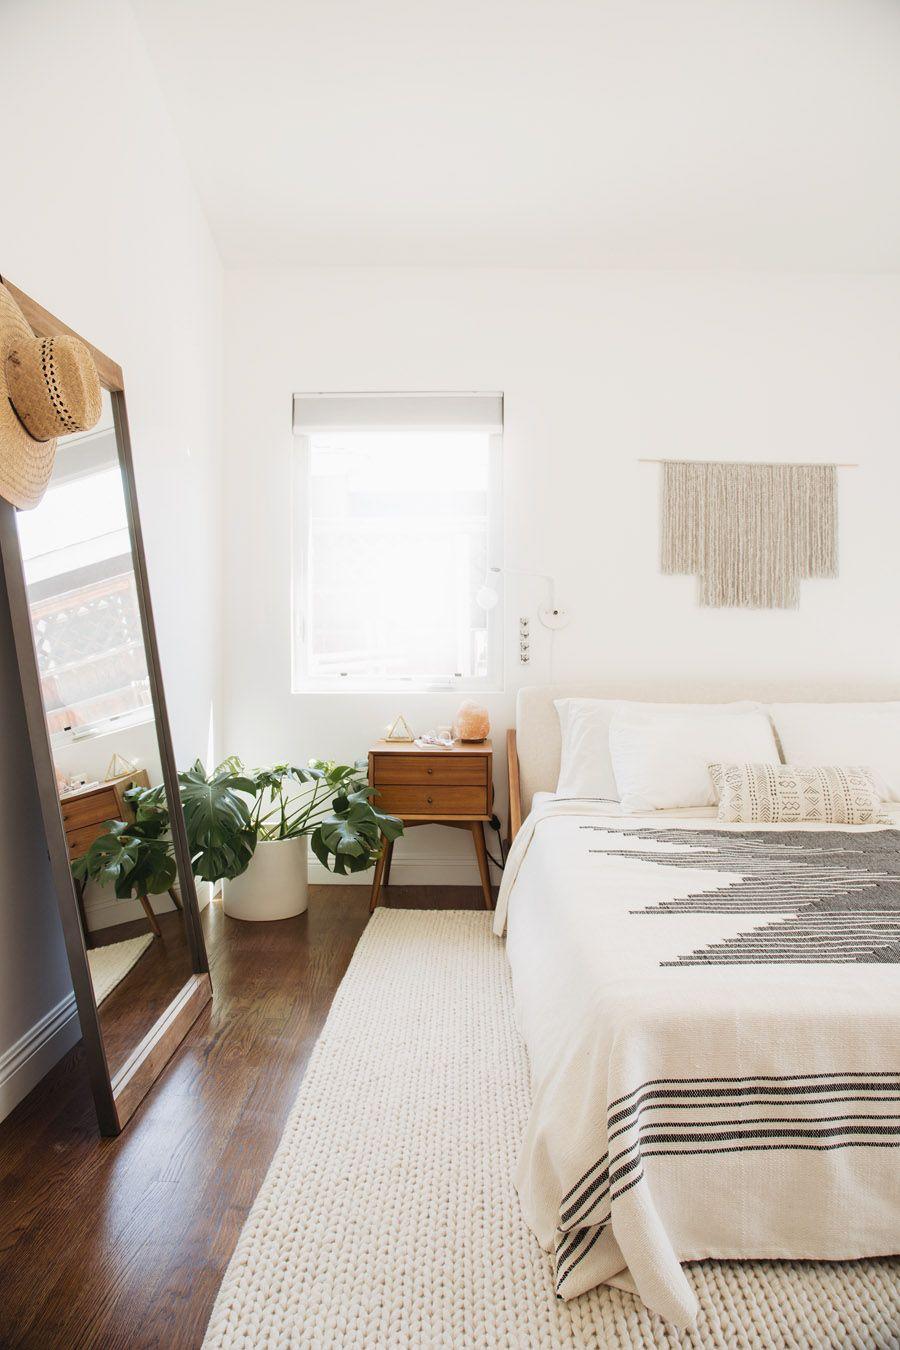 Pin by rosalie catanoso on h o m e pinterest bedroom minimalist